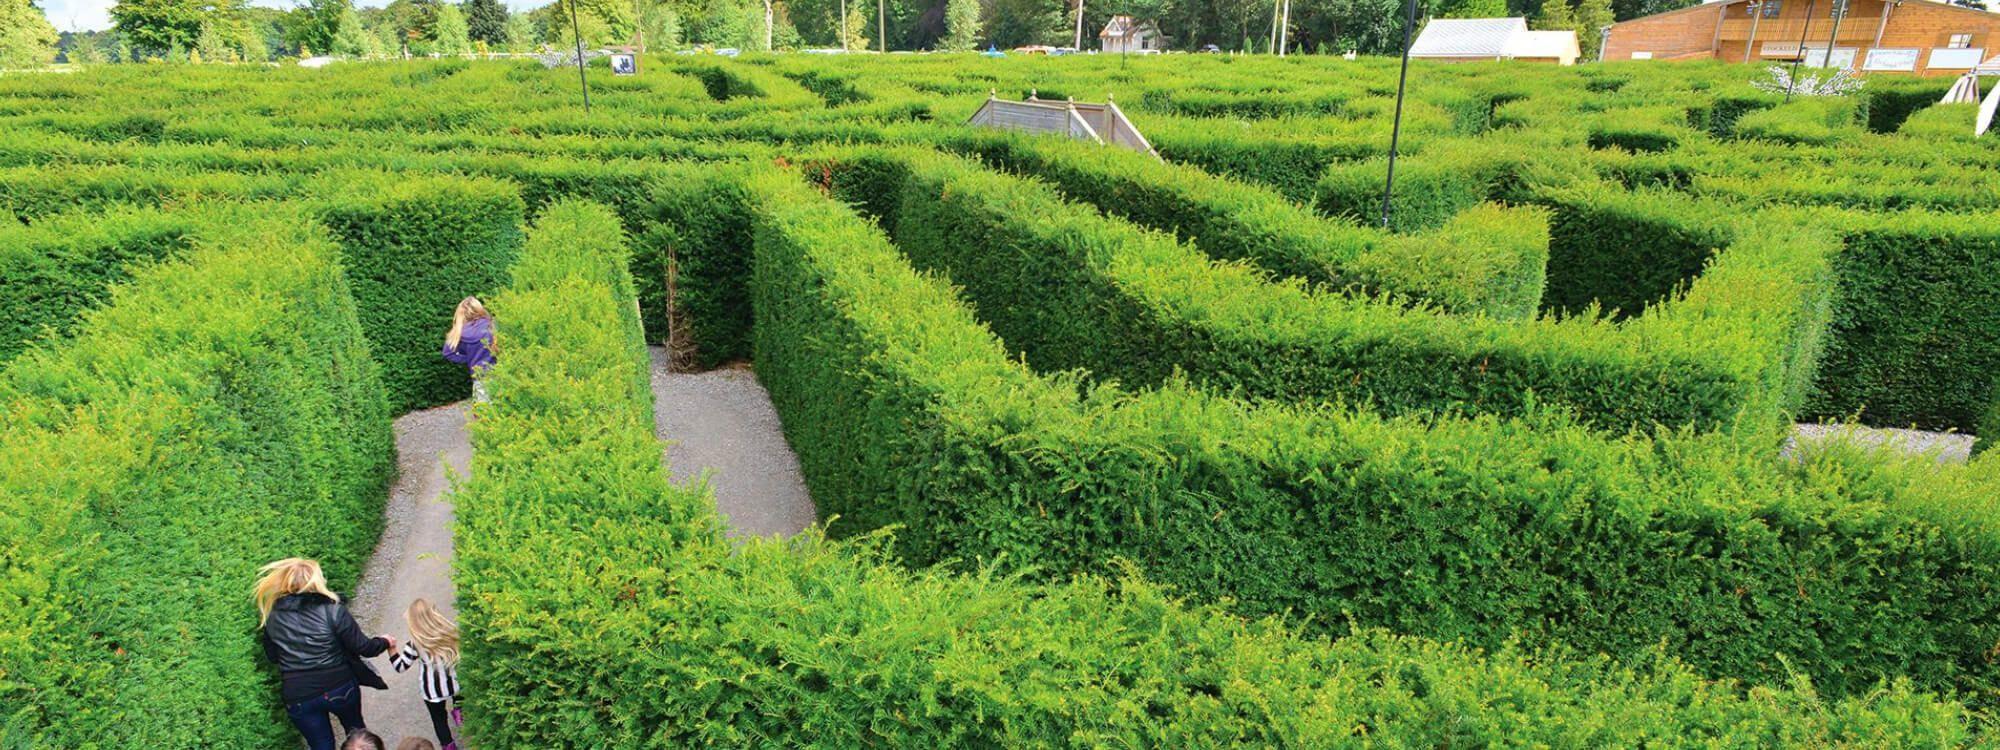 Stockeld Park Maze